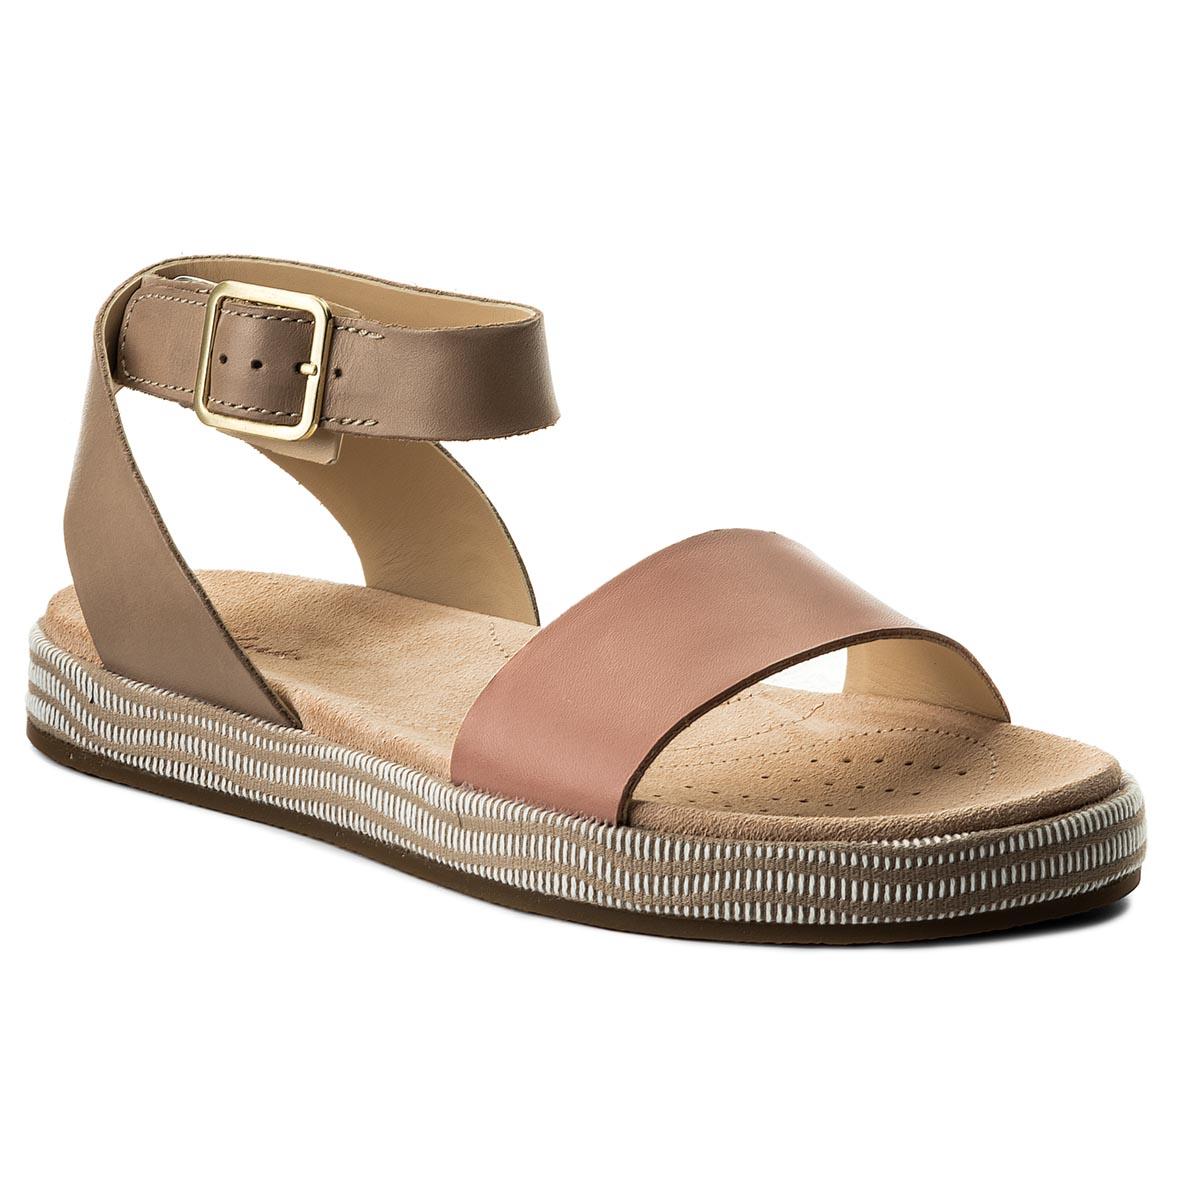 9baac0eb2 Sandals CLARKS - Botanic Ivy 261319584 Yellow Combination - Casual ...